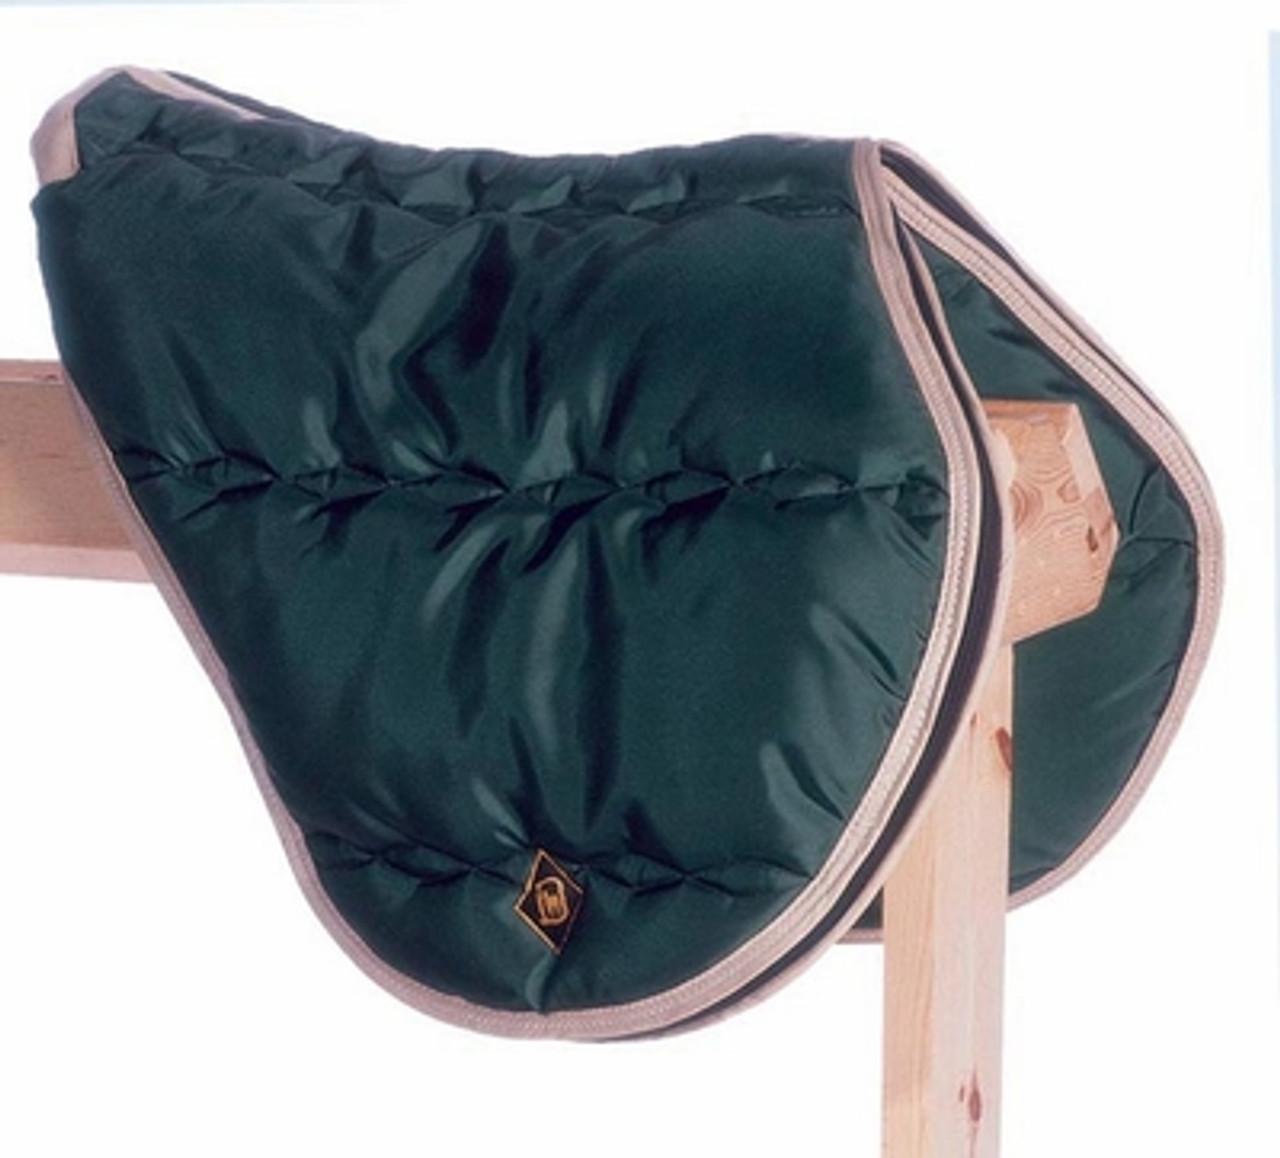 Big D English Saddle Case Equestrian Gear Bags